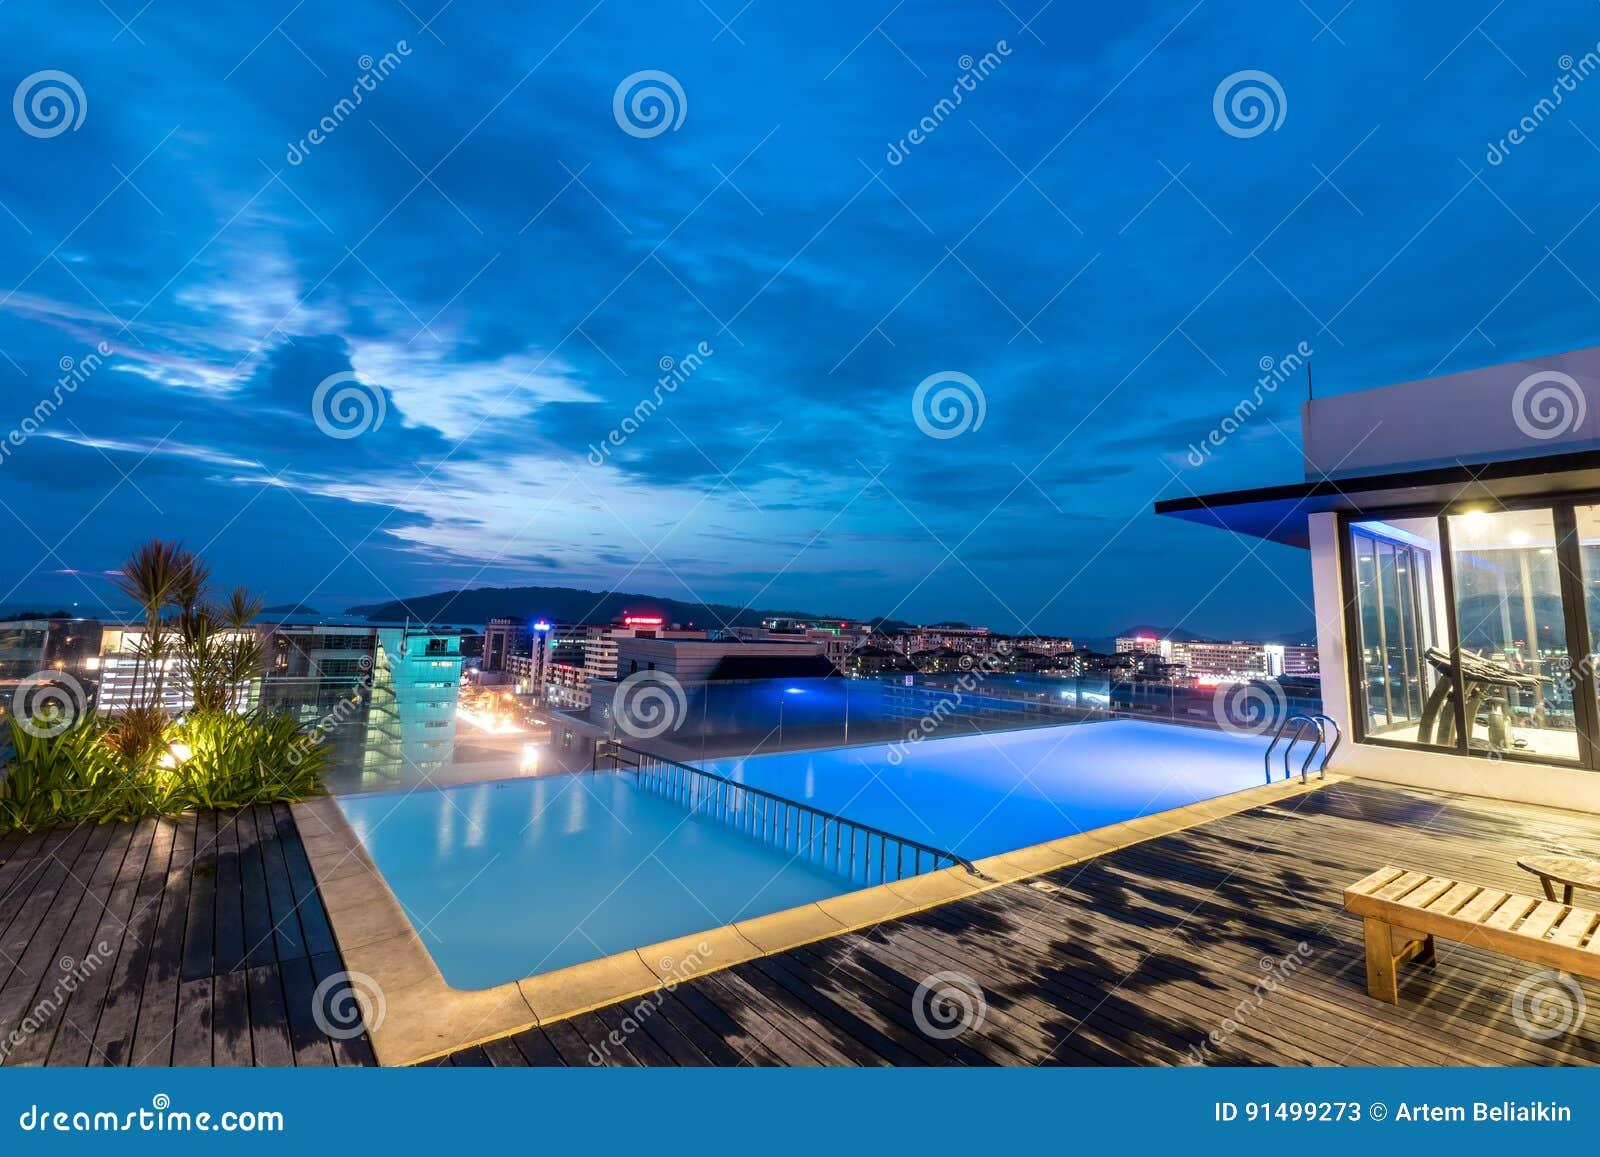 A resort swimming pool on the roof at night. Kota Kinabalu city, Malaysia.